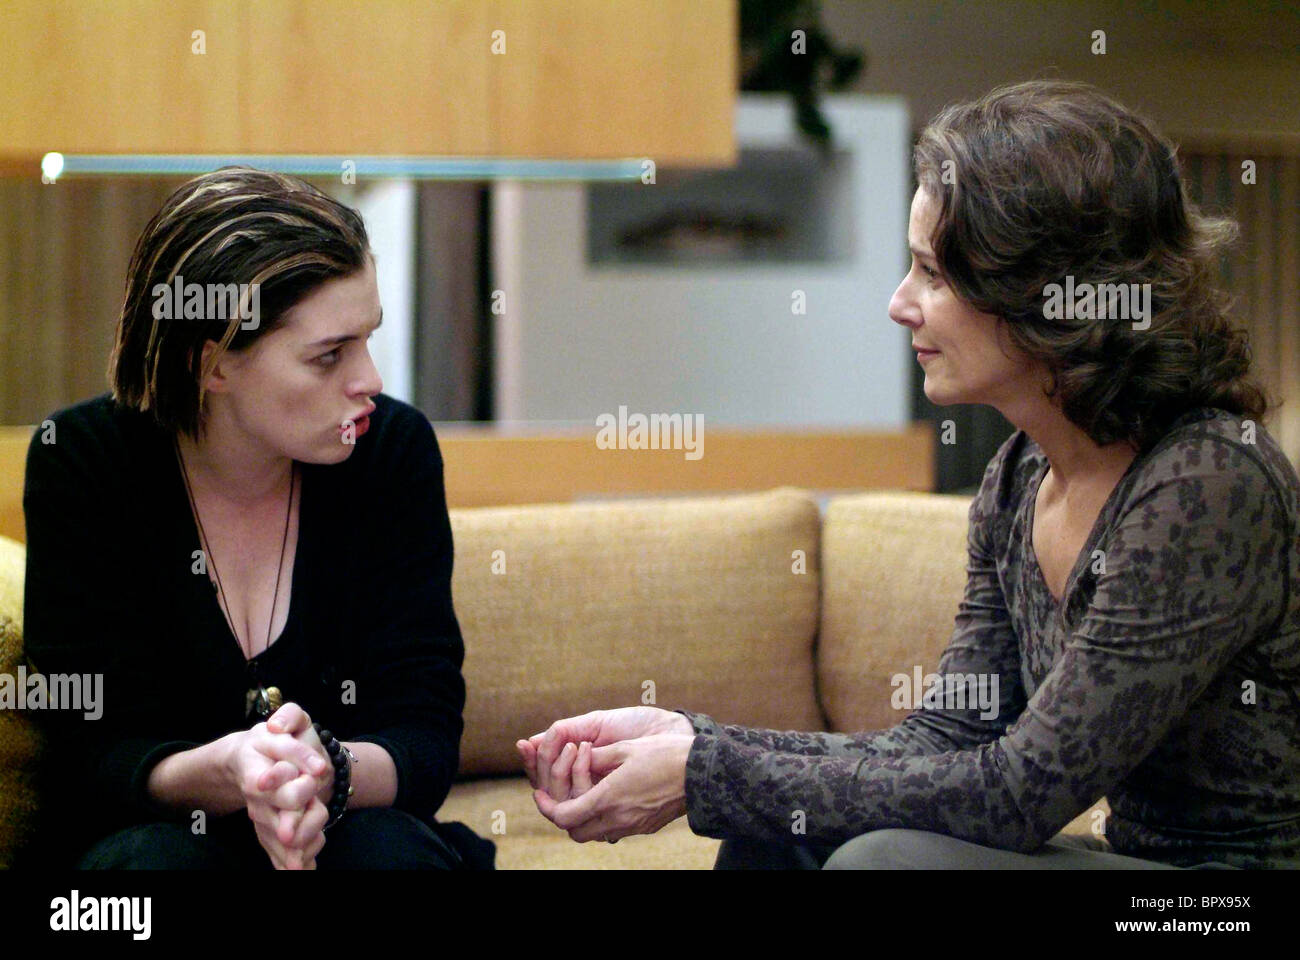 Anne Hathaway etcRachel Getting Married - 2008 HD 720 new photo